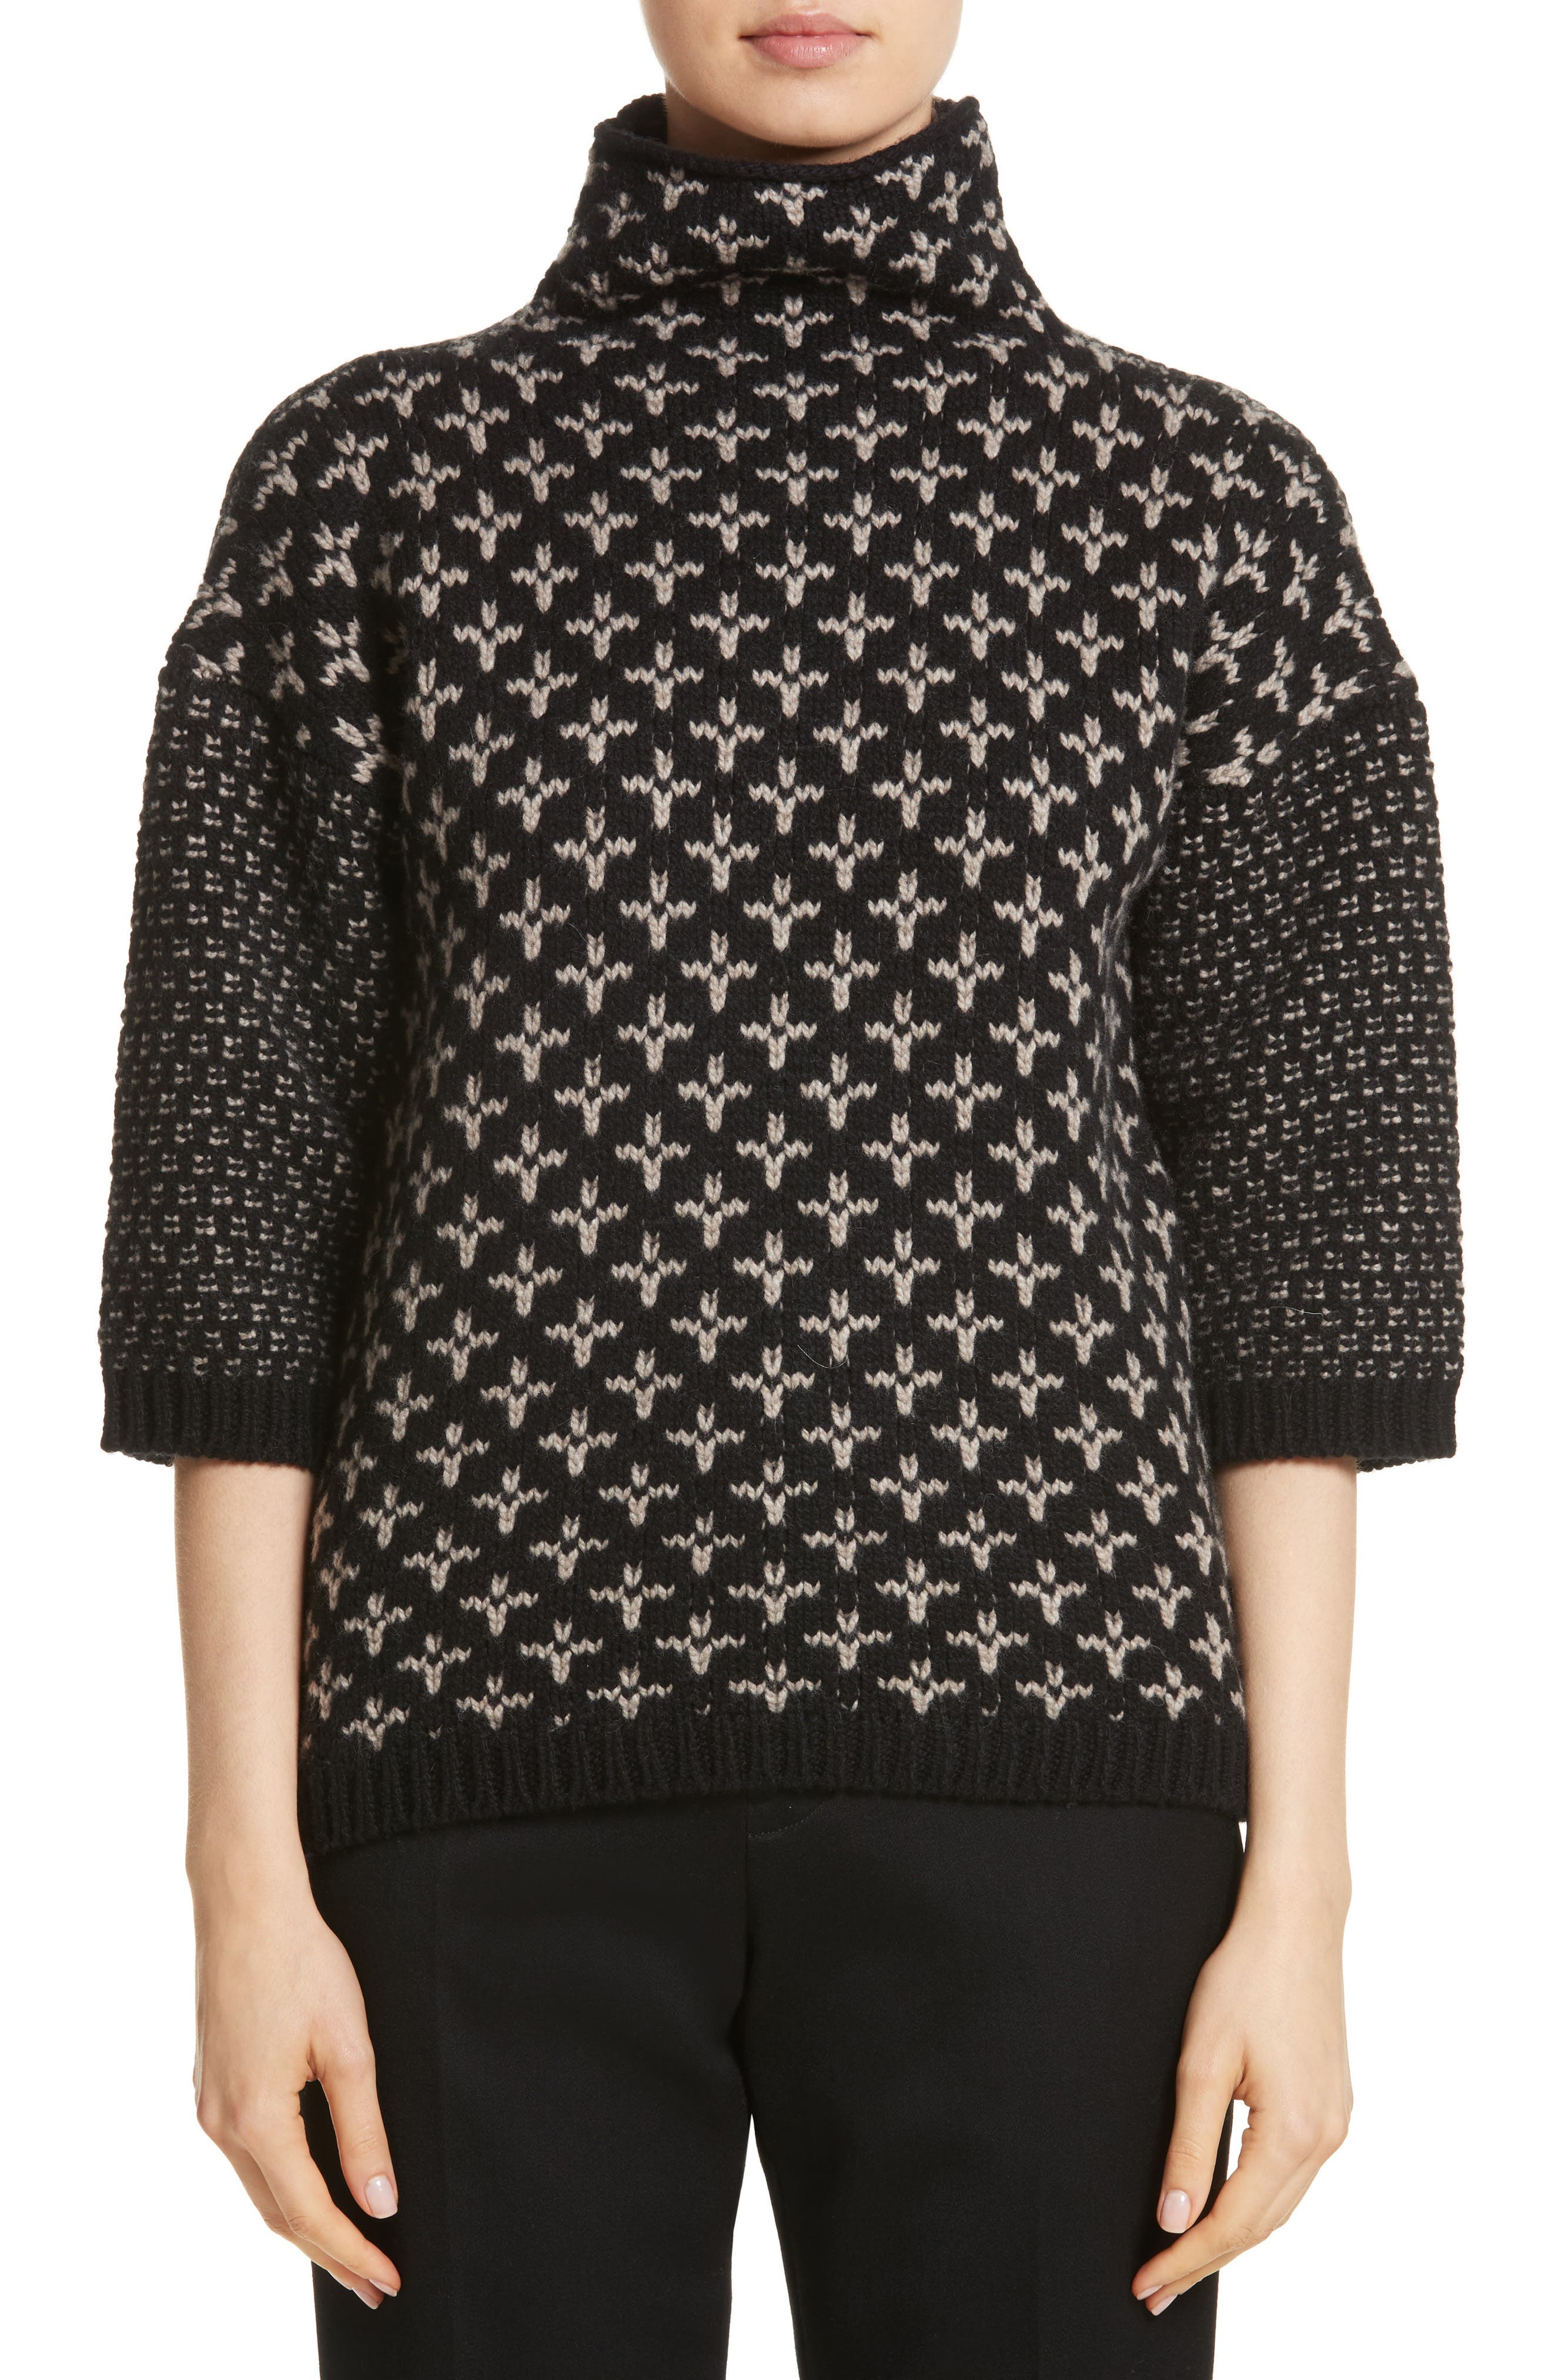 Max Mara Rana Wool & Cashmere Sweater